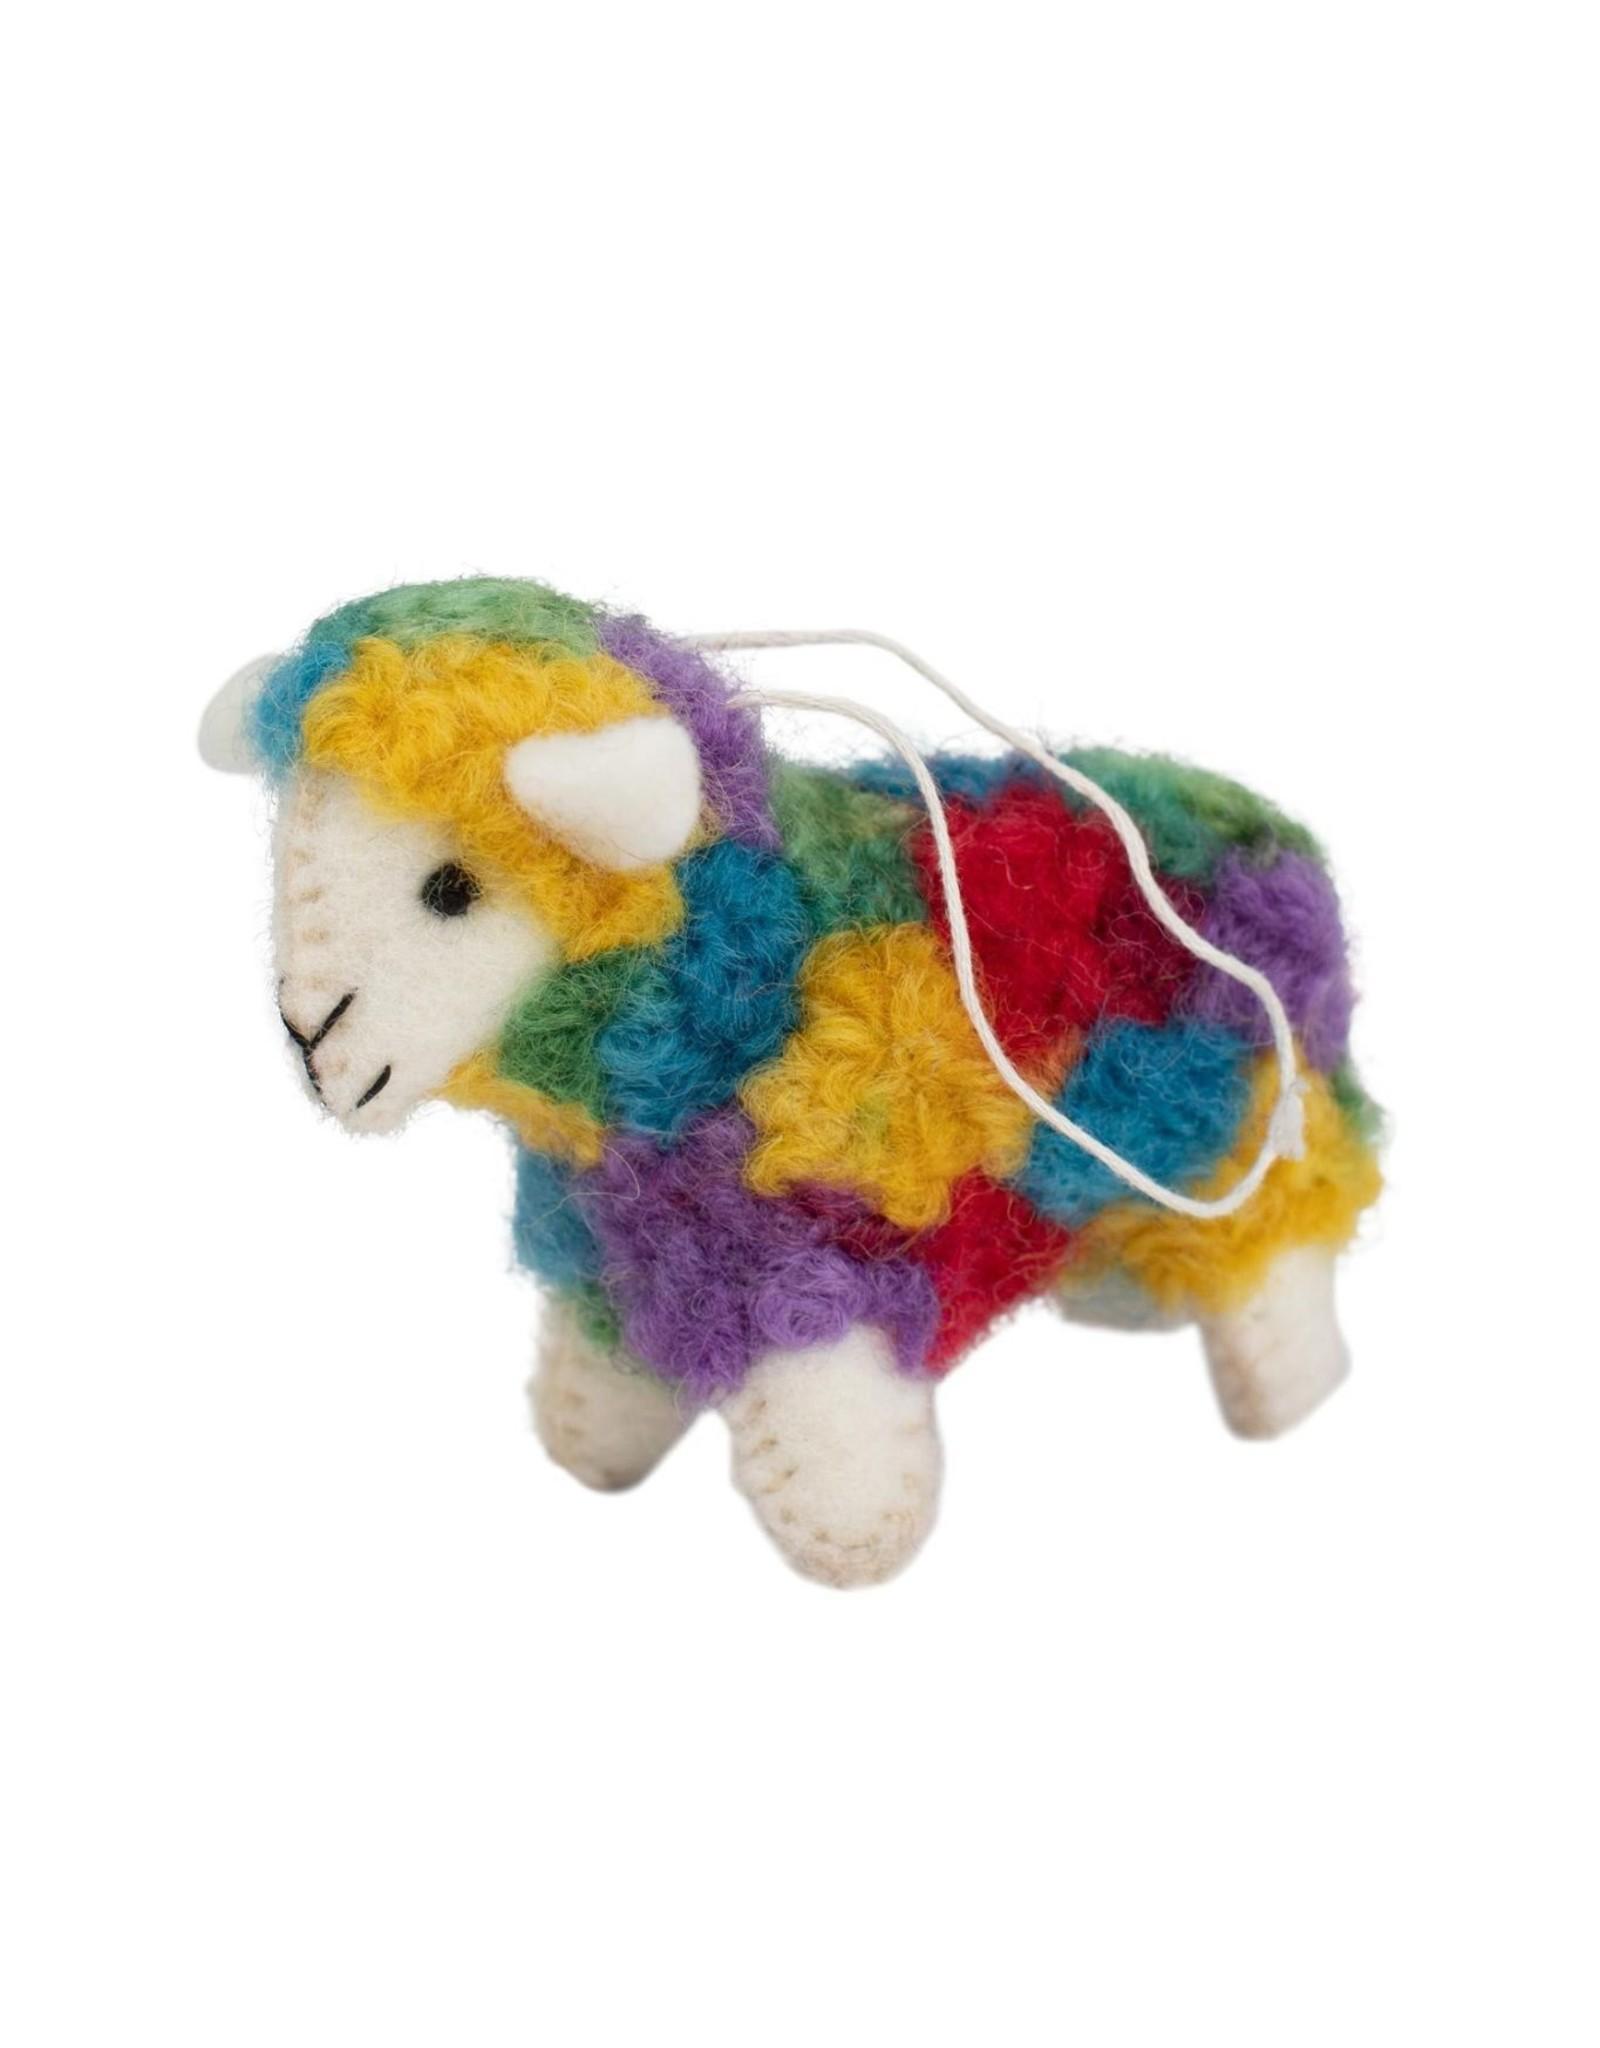 Colorful Sheep Ornament